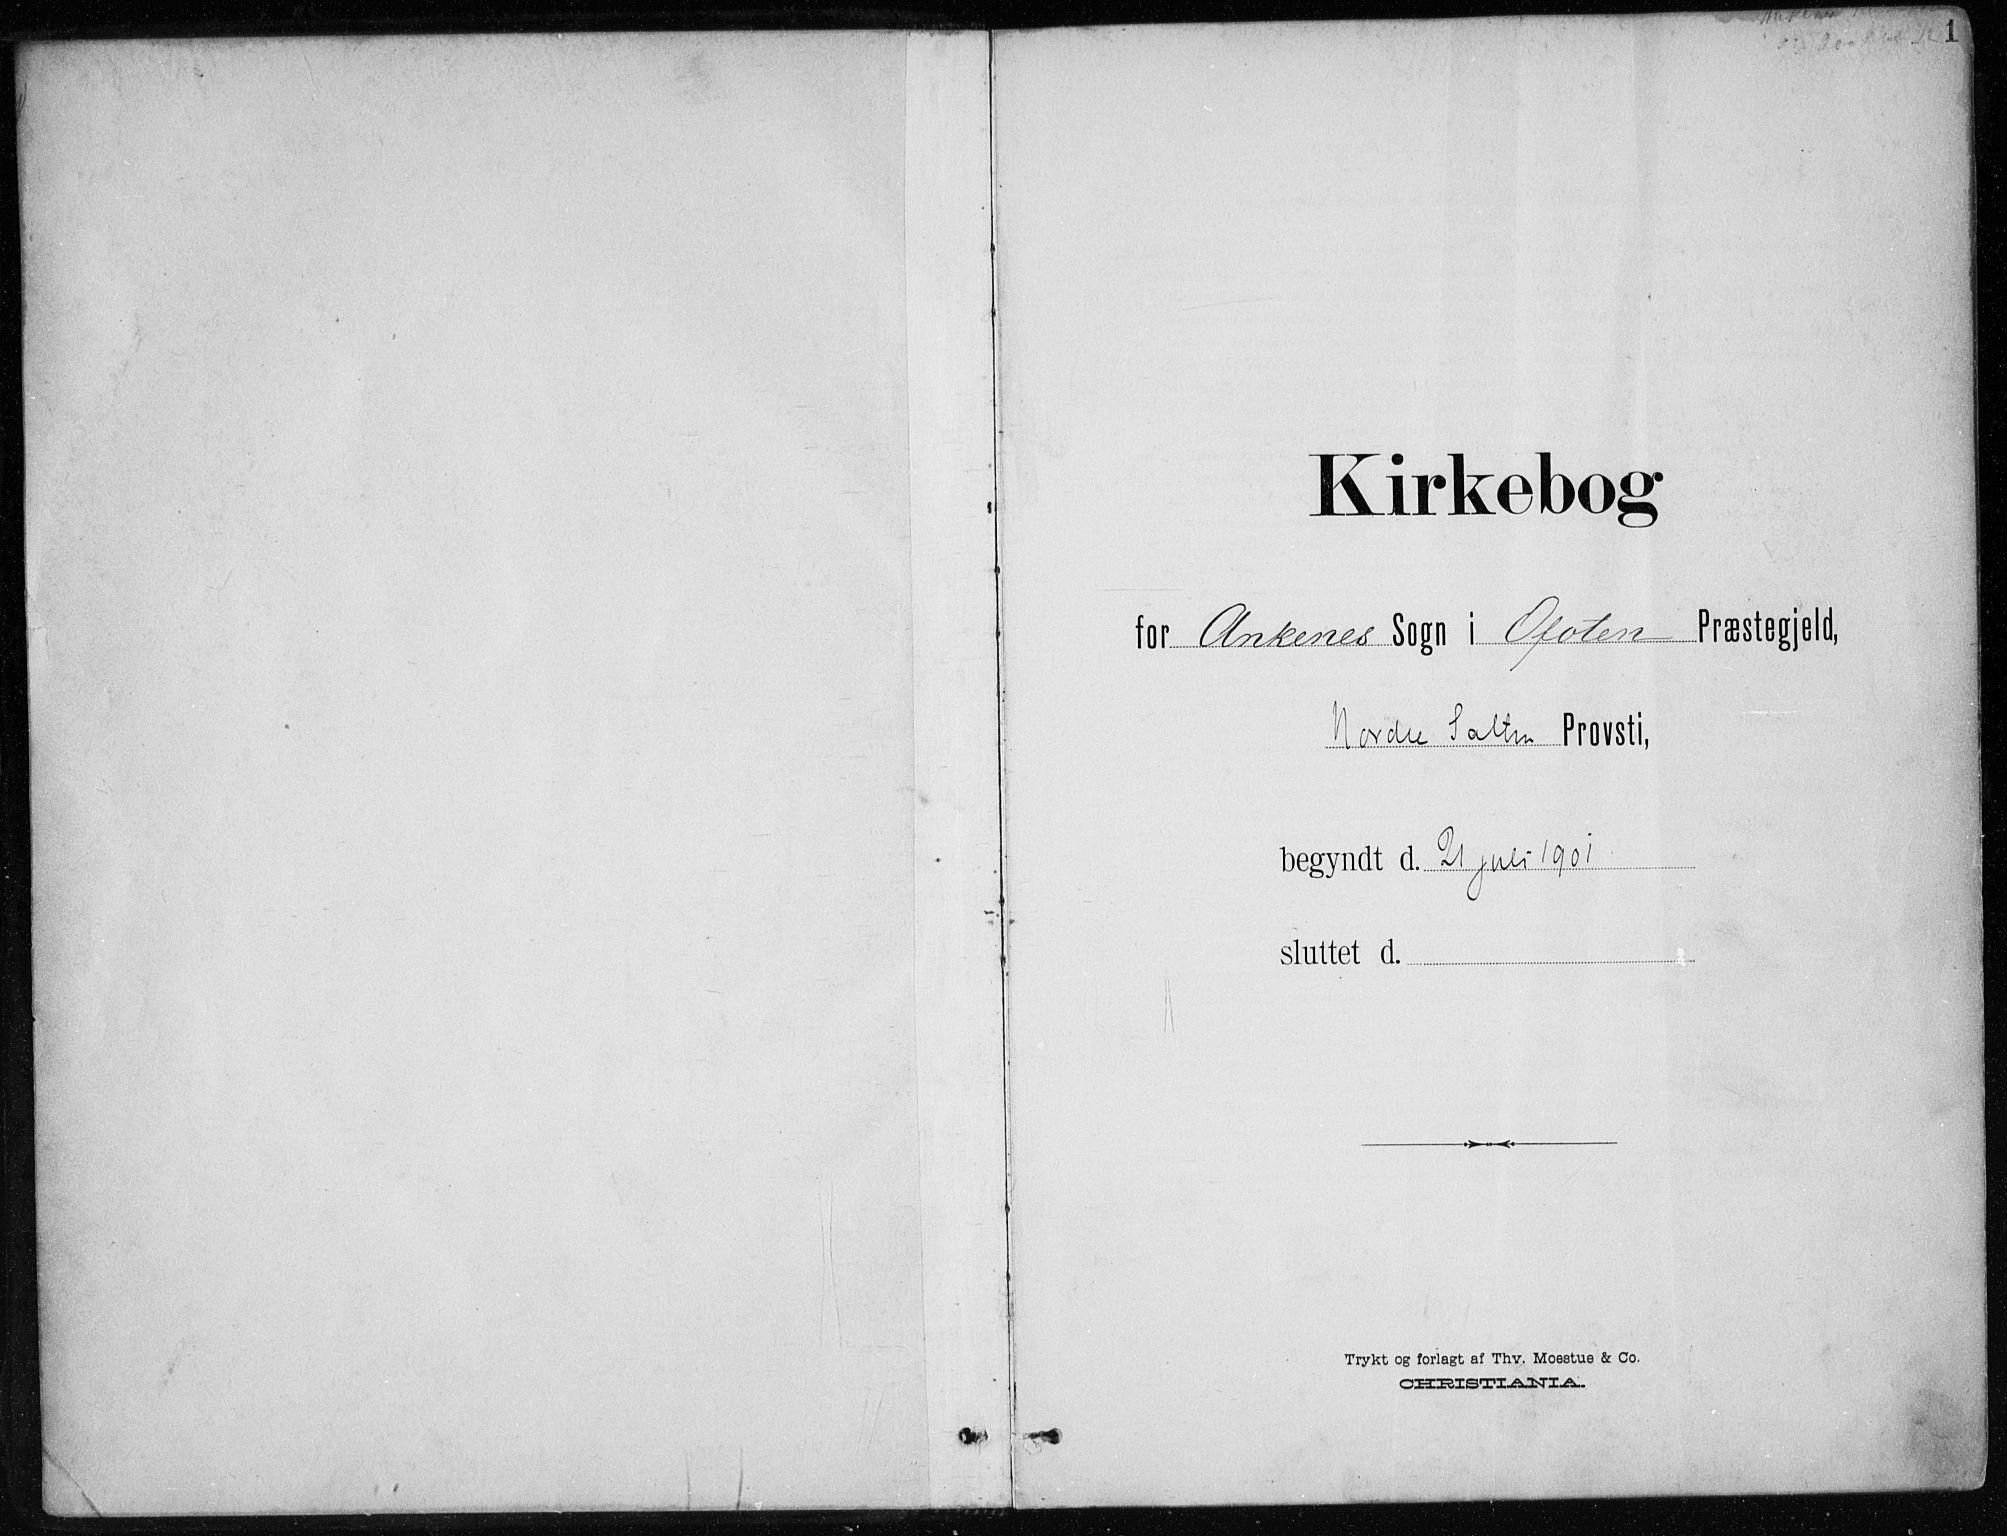 SAT, Ministerialprotokoller, klokkerbøker og fødselsregistre - Nordland, 866/L0941: Ministerialbok nr. 866A04, 1901-1917, s. 1